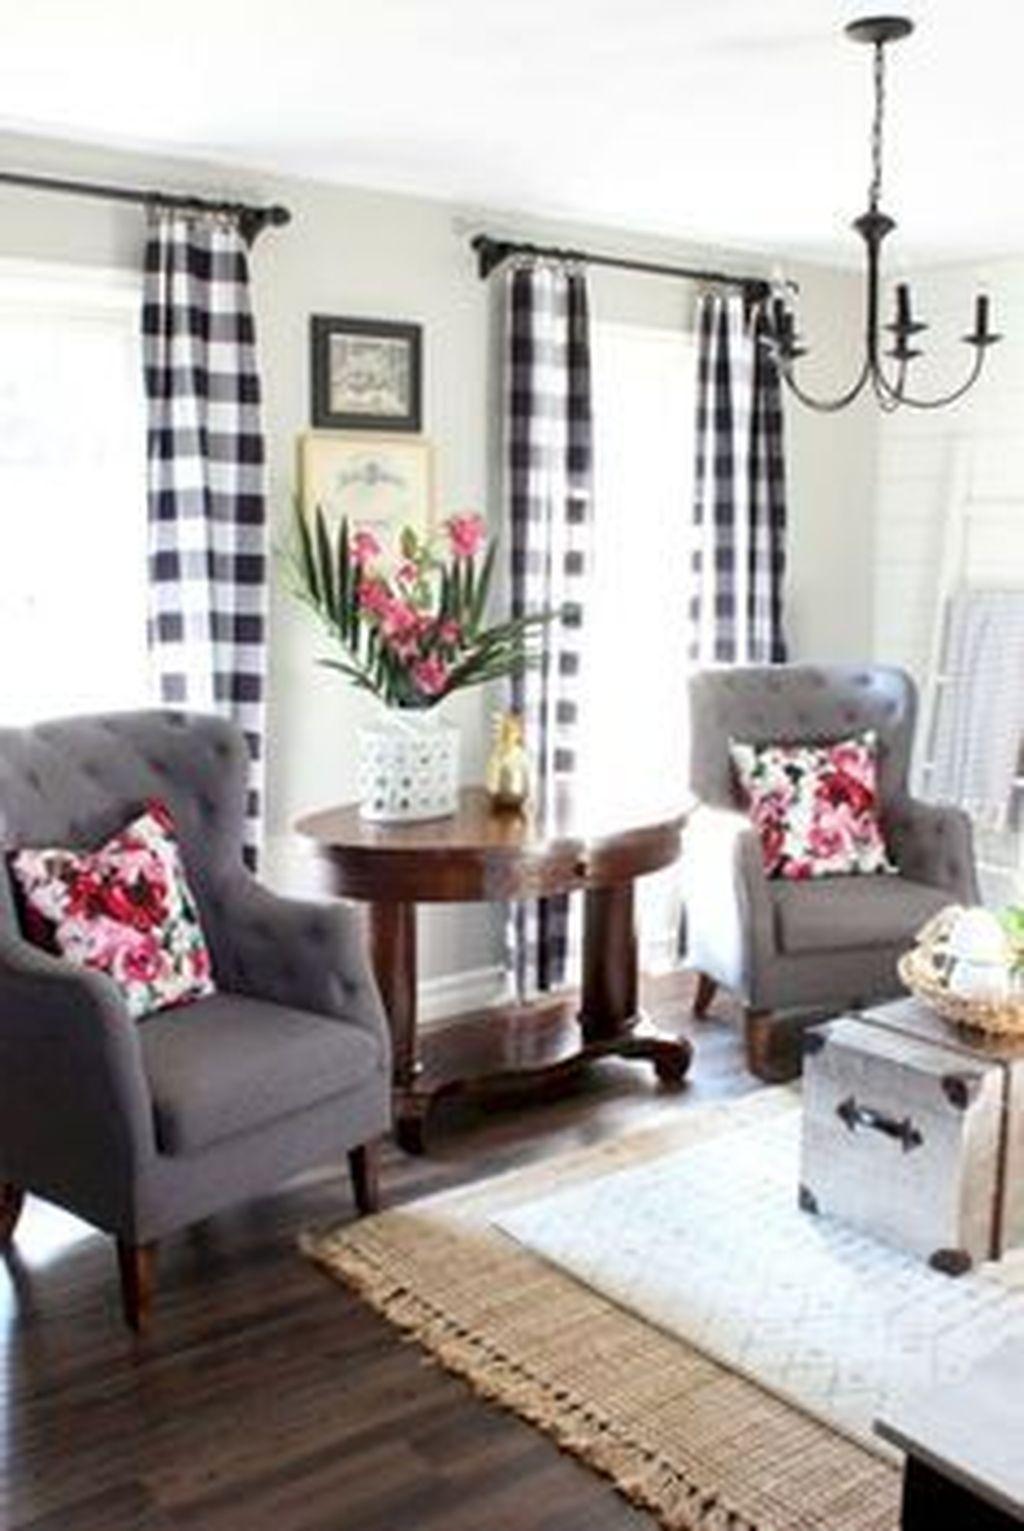 Enchanting Living Room Decor Ideas That Trending This Winter 04